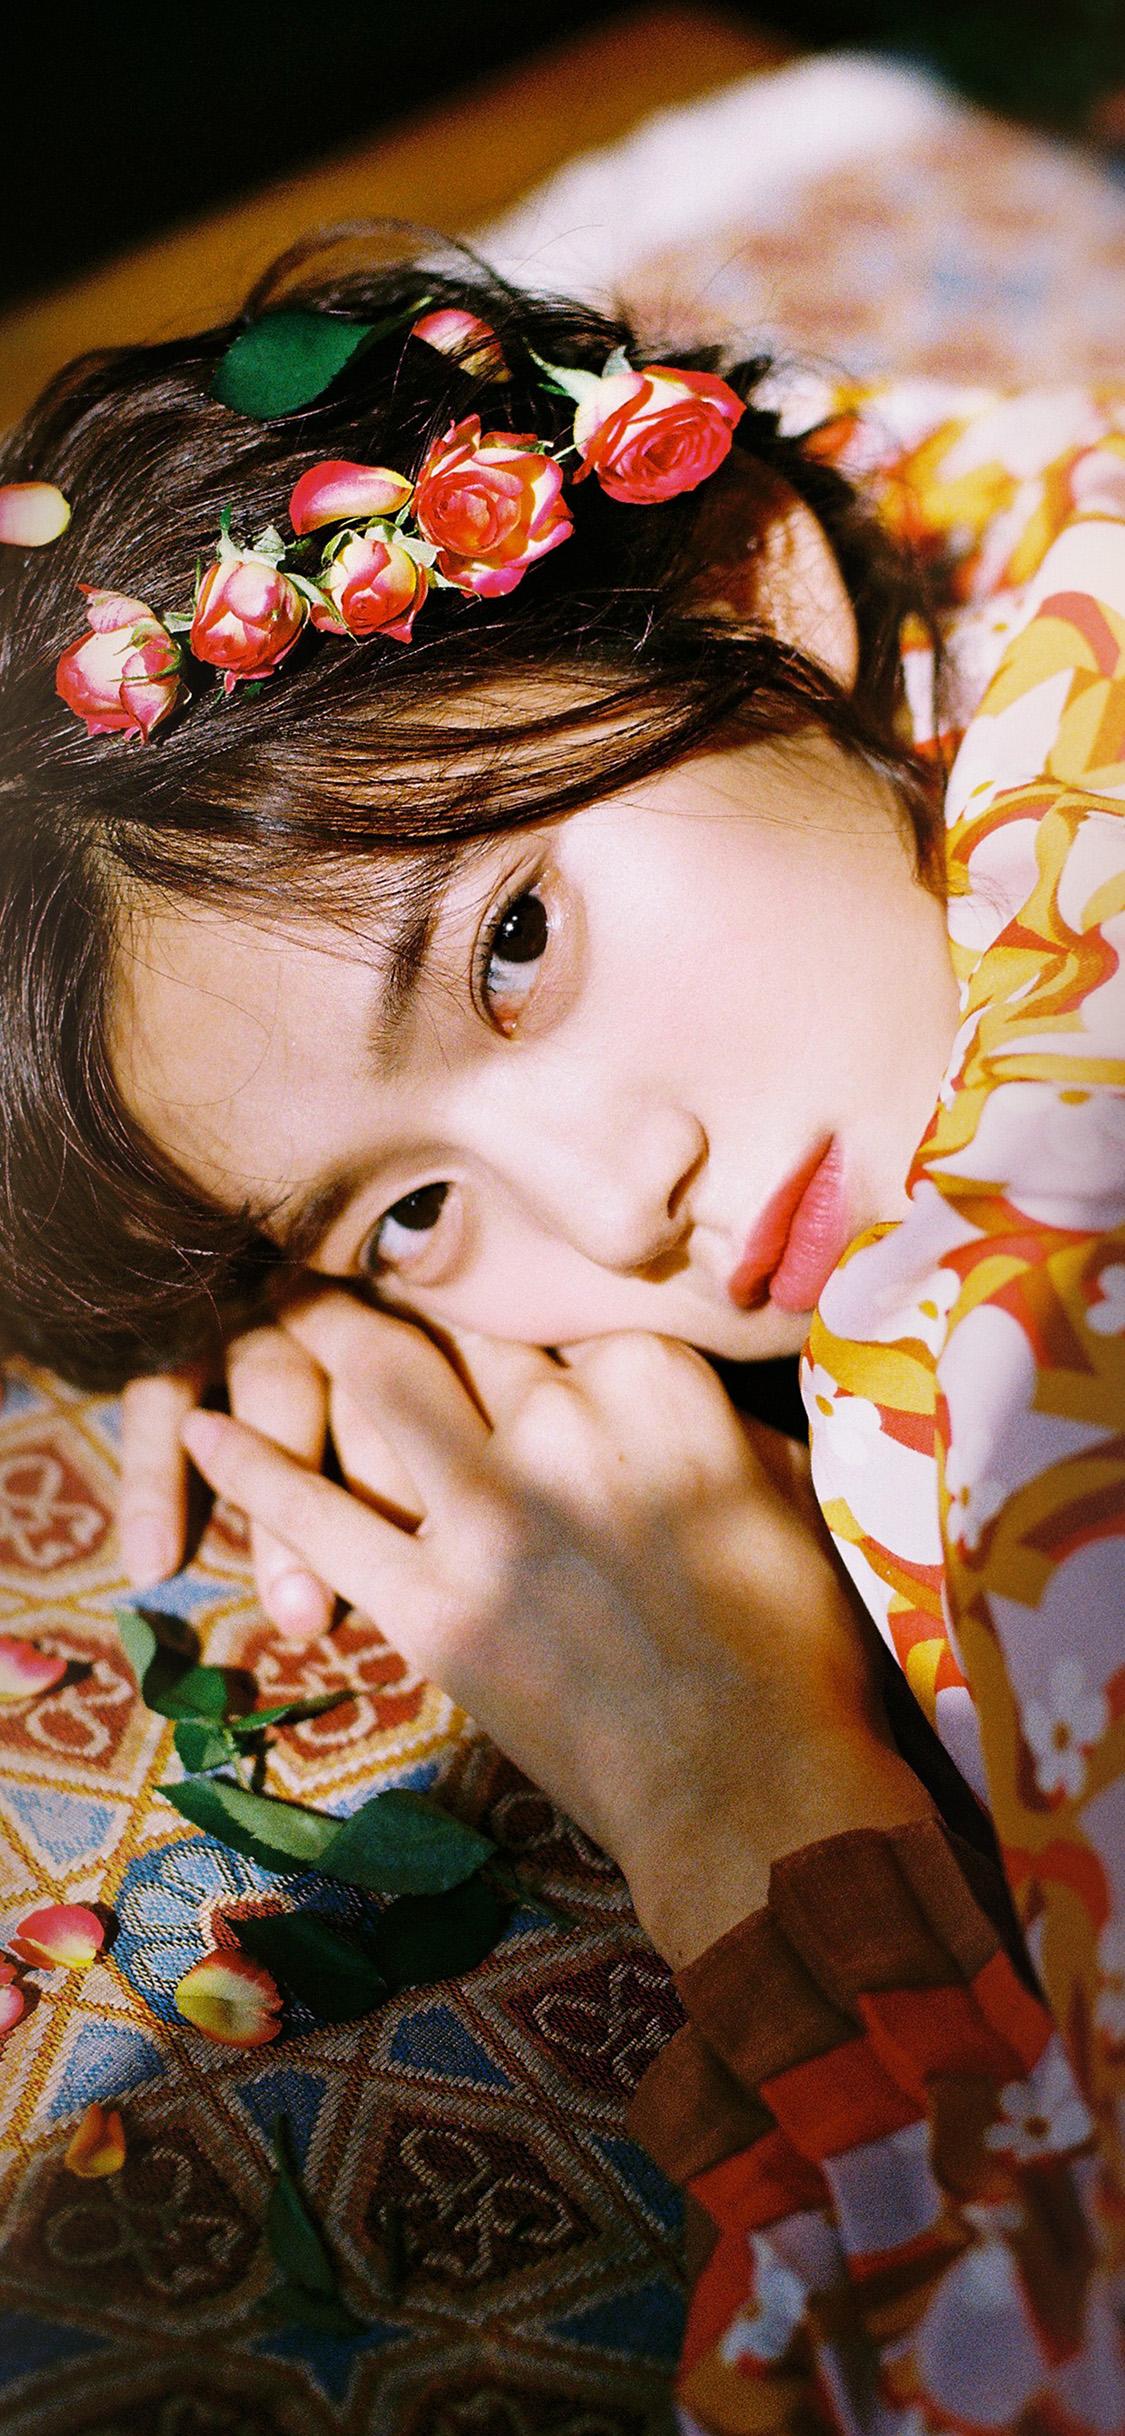 iPhonexpapers.com-Apple-iPhone-wallpaper-hr04-girl-flower-lying-summer-kpop